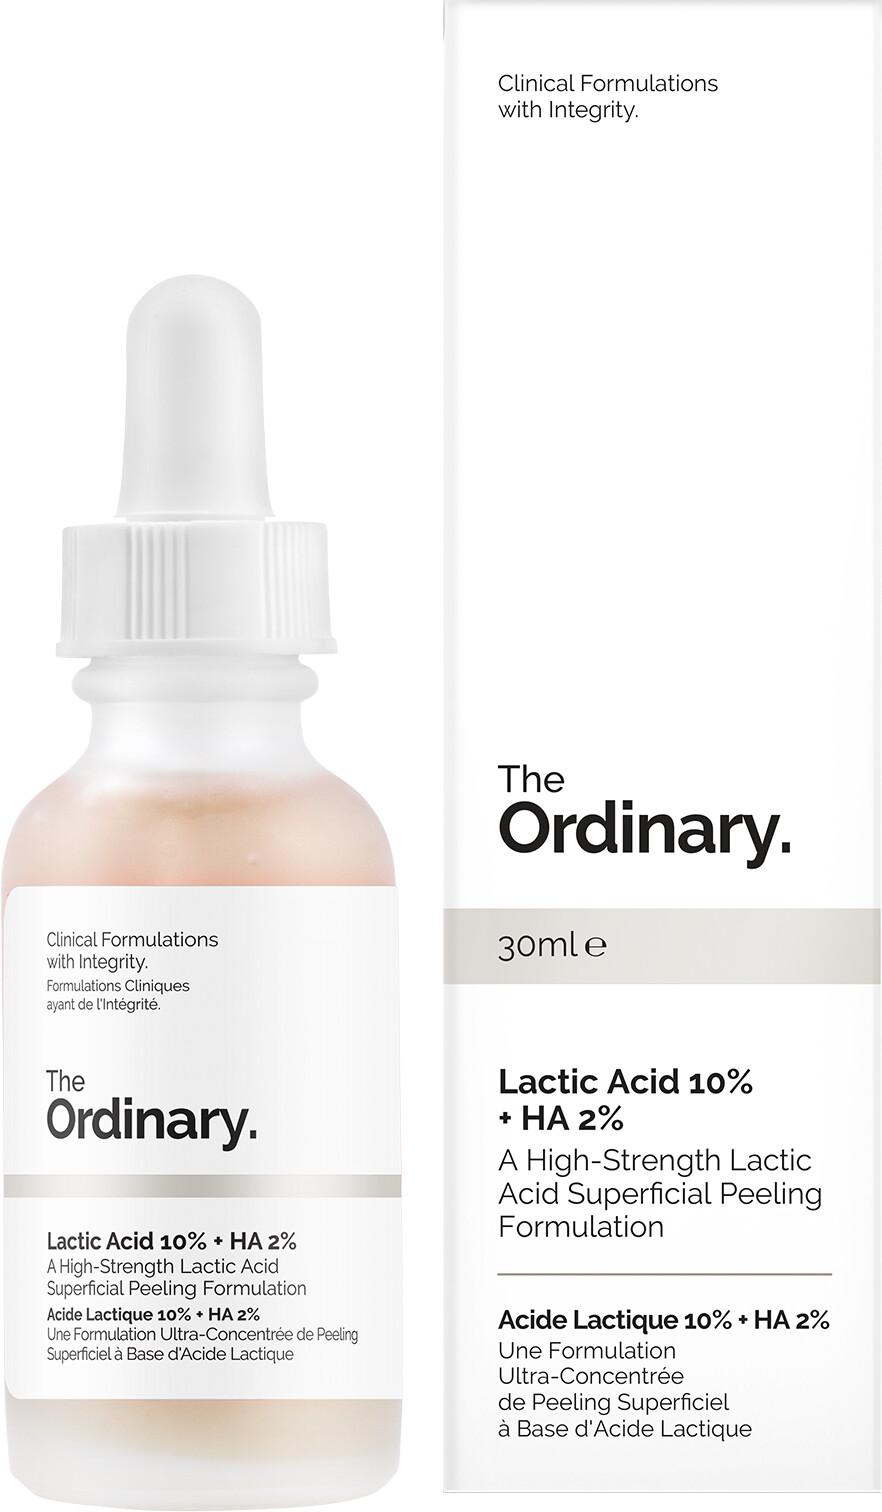 The Ordinary Lactic Acid 10 Ha 2